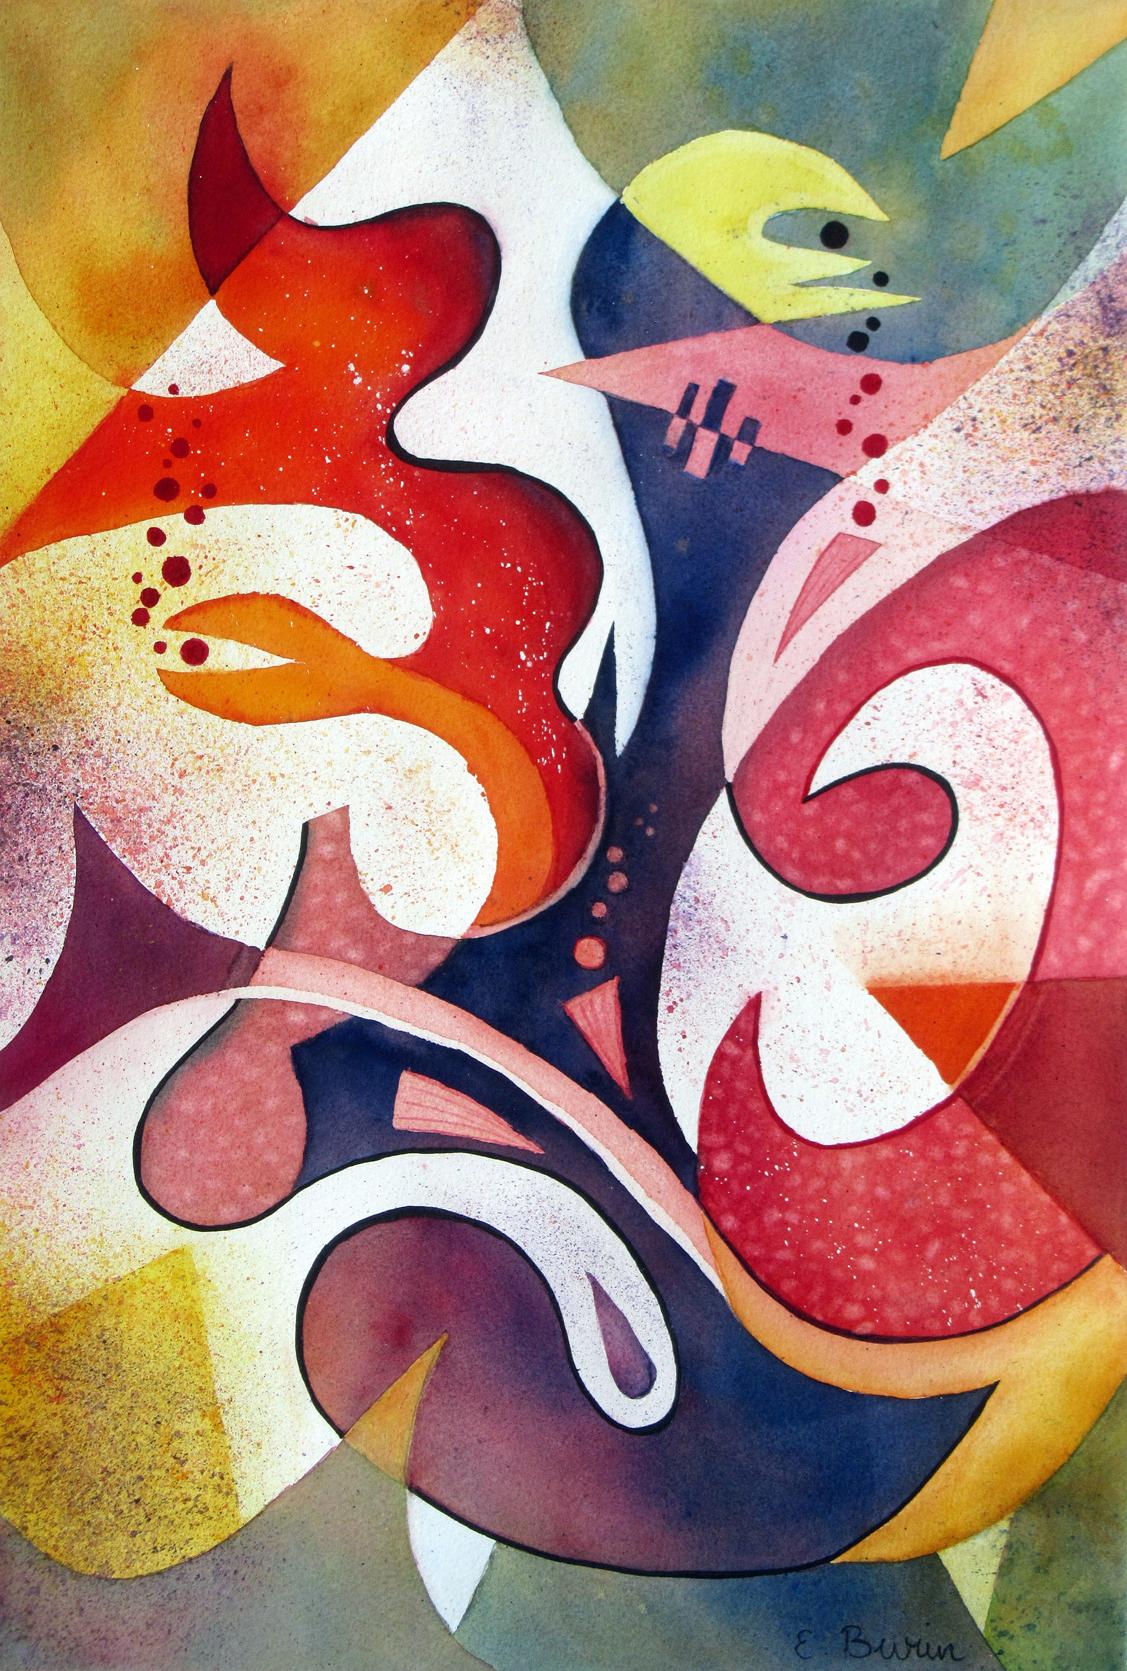 20496922-ElizabethBurin-BrassBand-watercolor-18.5x12.5-550.jpg